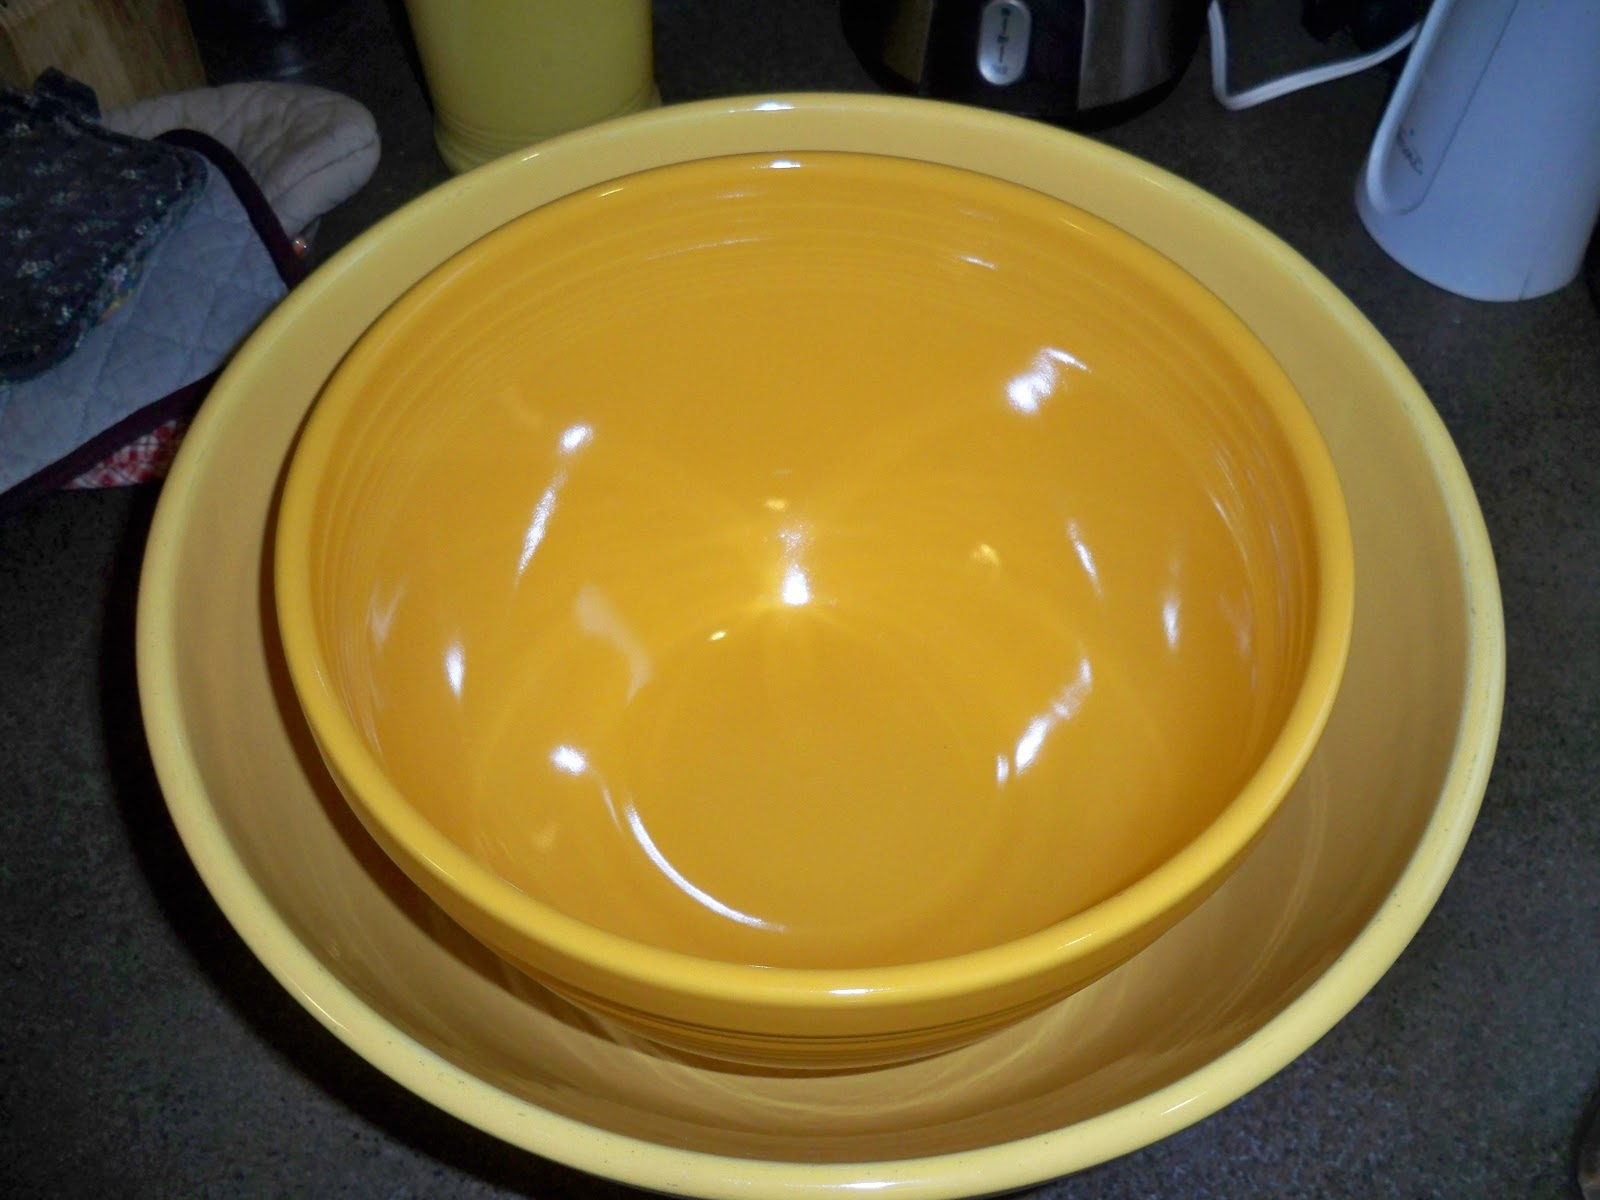 One Dish Dude: Fiesta vs. Bauer: A Comparison